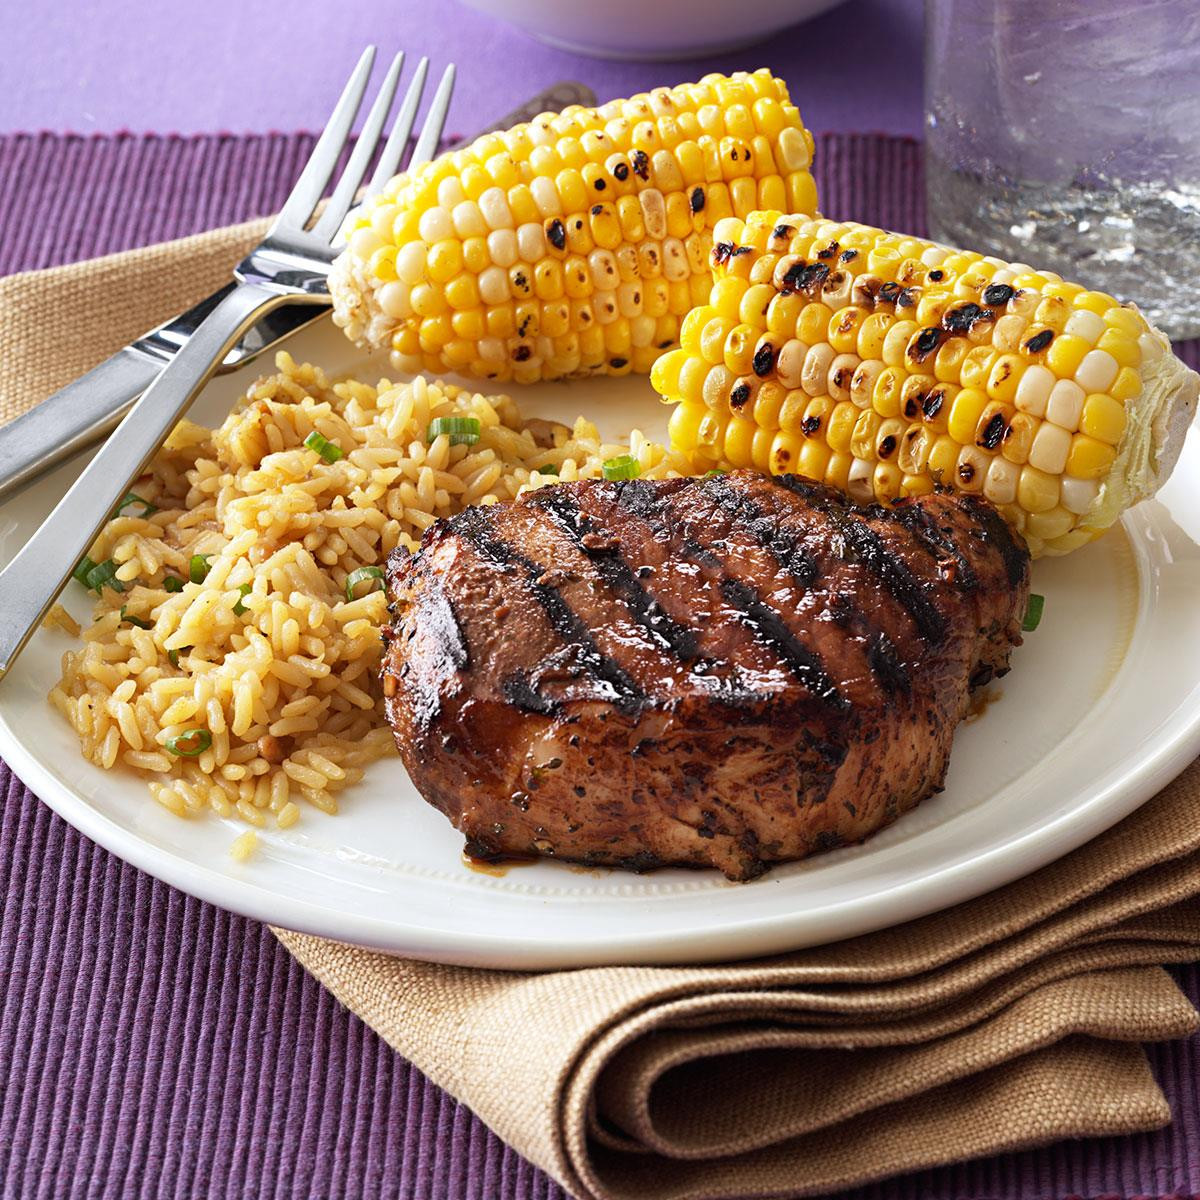 Grill Pork Chops  Favorite Grilled Pork Chops Recipe